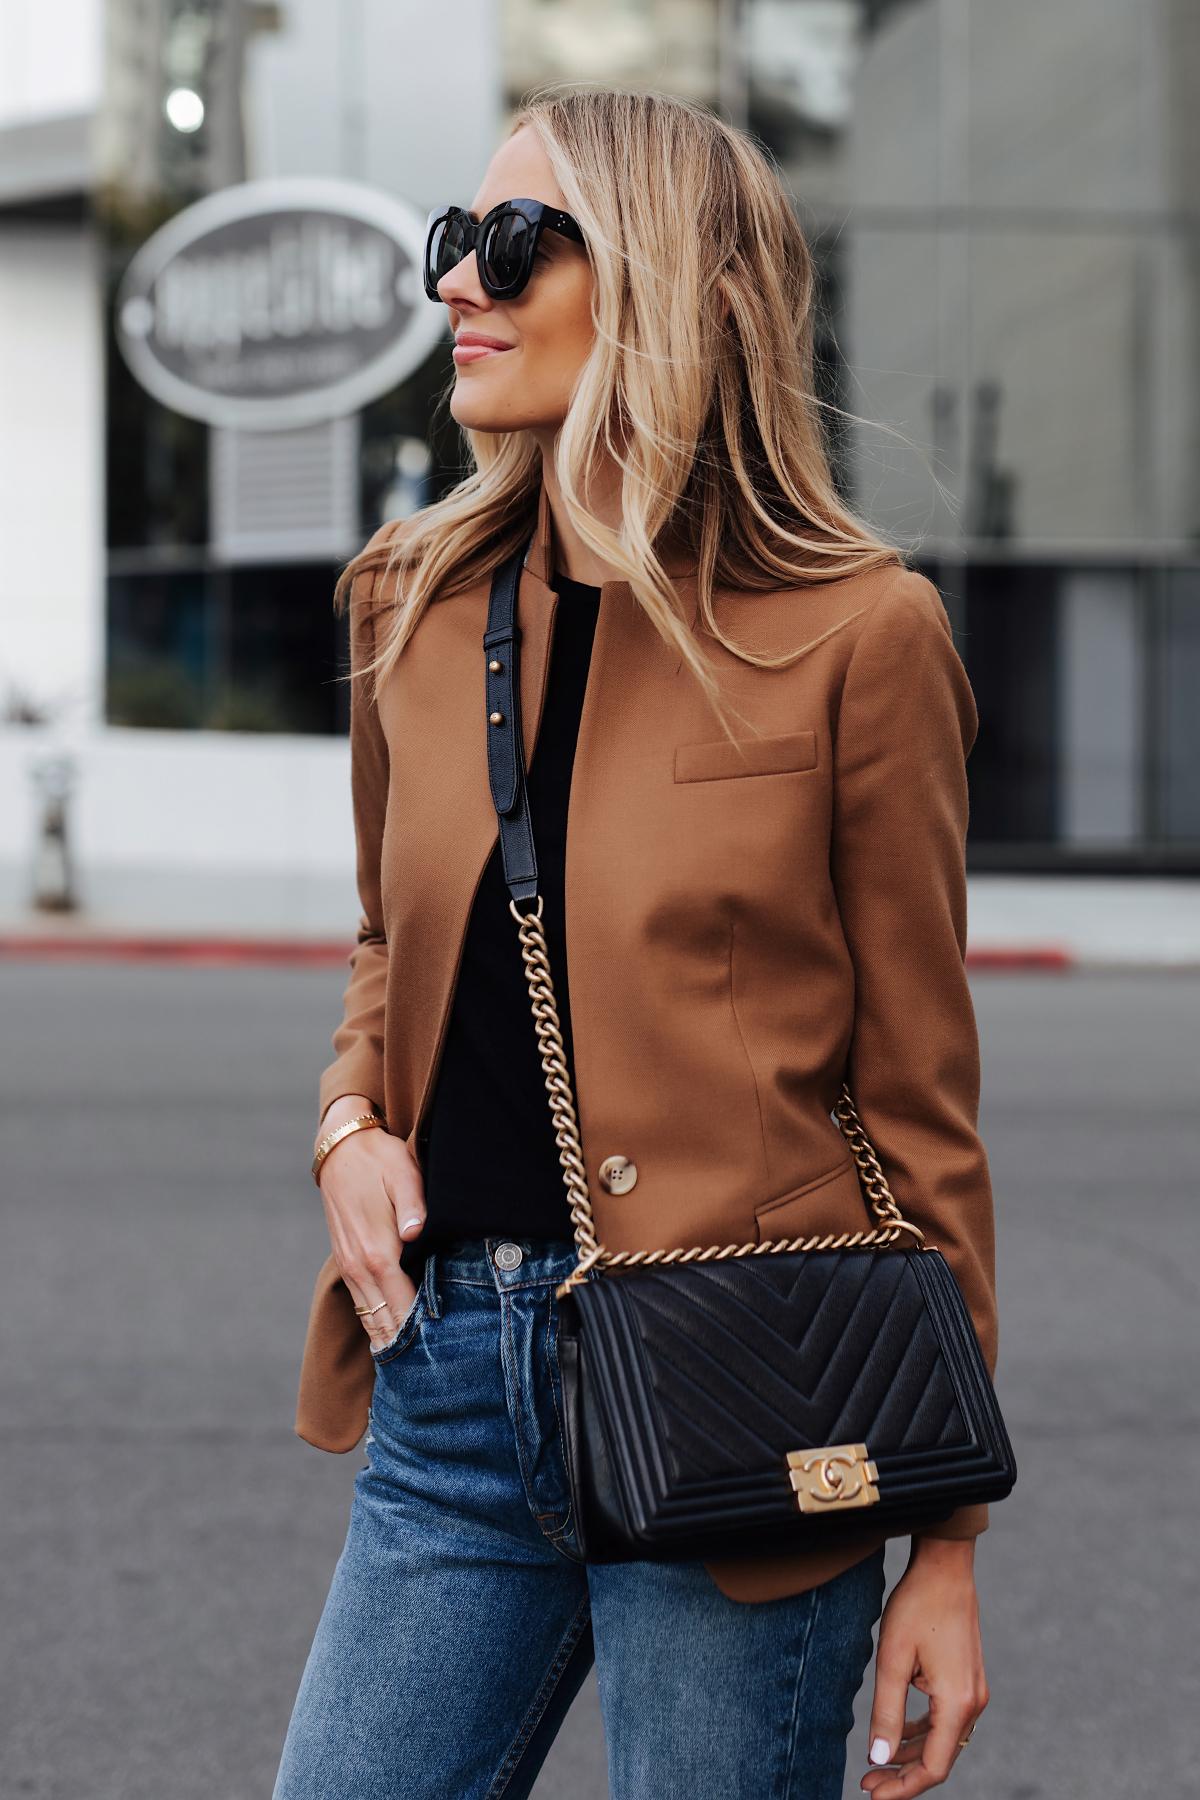 Blonde Woman Wearing Camel Blazer eBay Authenticate Chanel Black Boy Bag Fashion Jackson San Diego Fashion Blogger Street Style